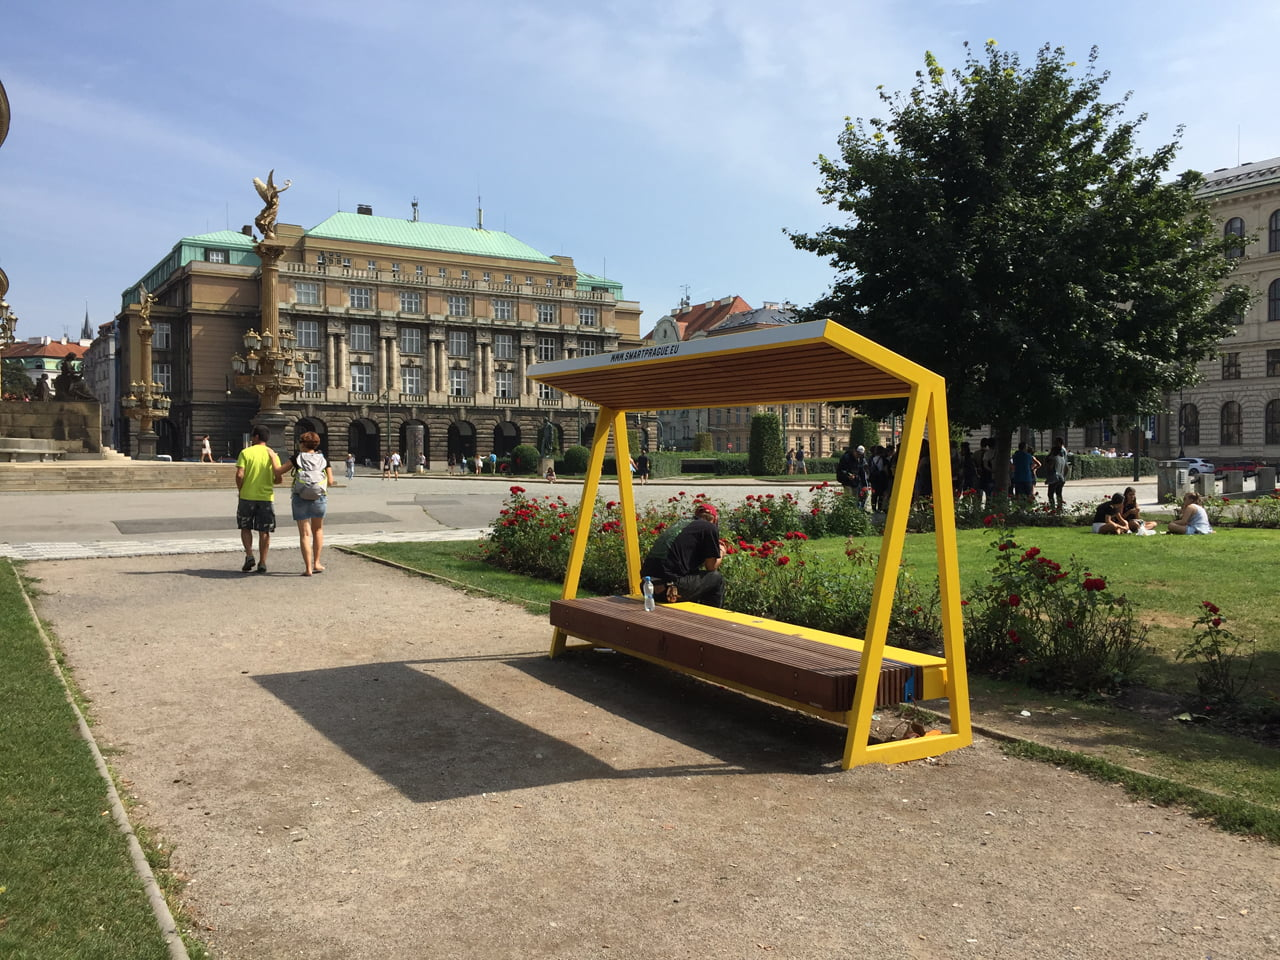 Chytrá lavička smartcité od mmcité u Rudolfina v Praze